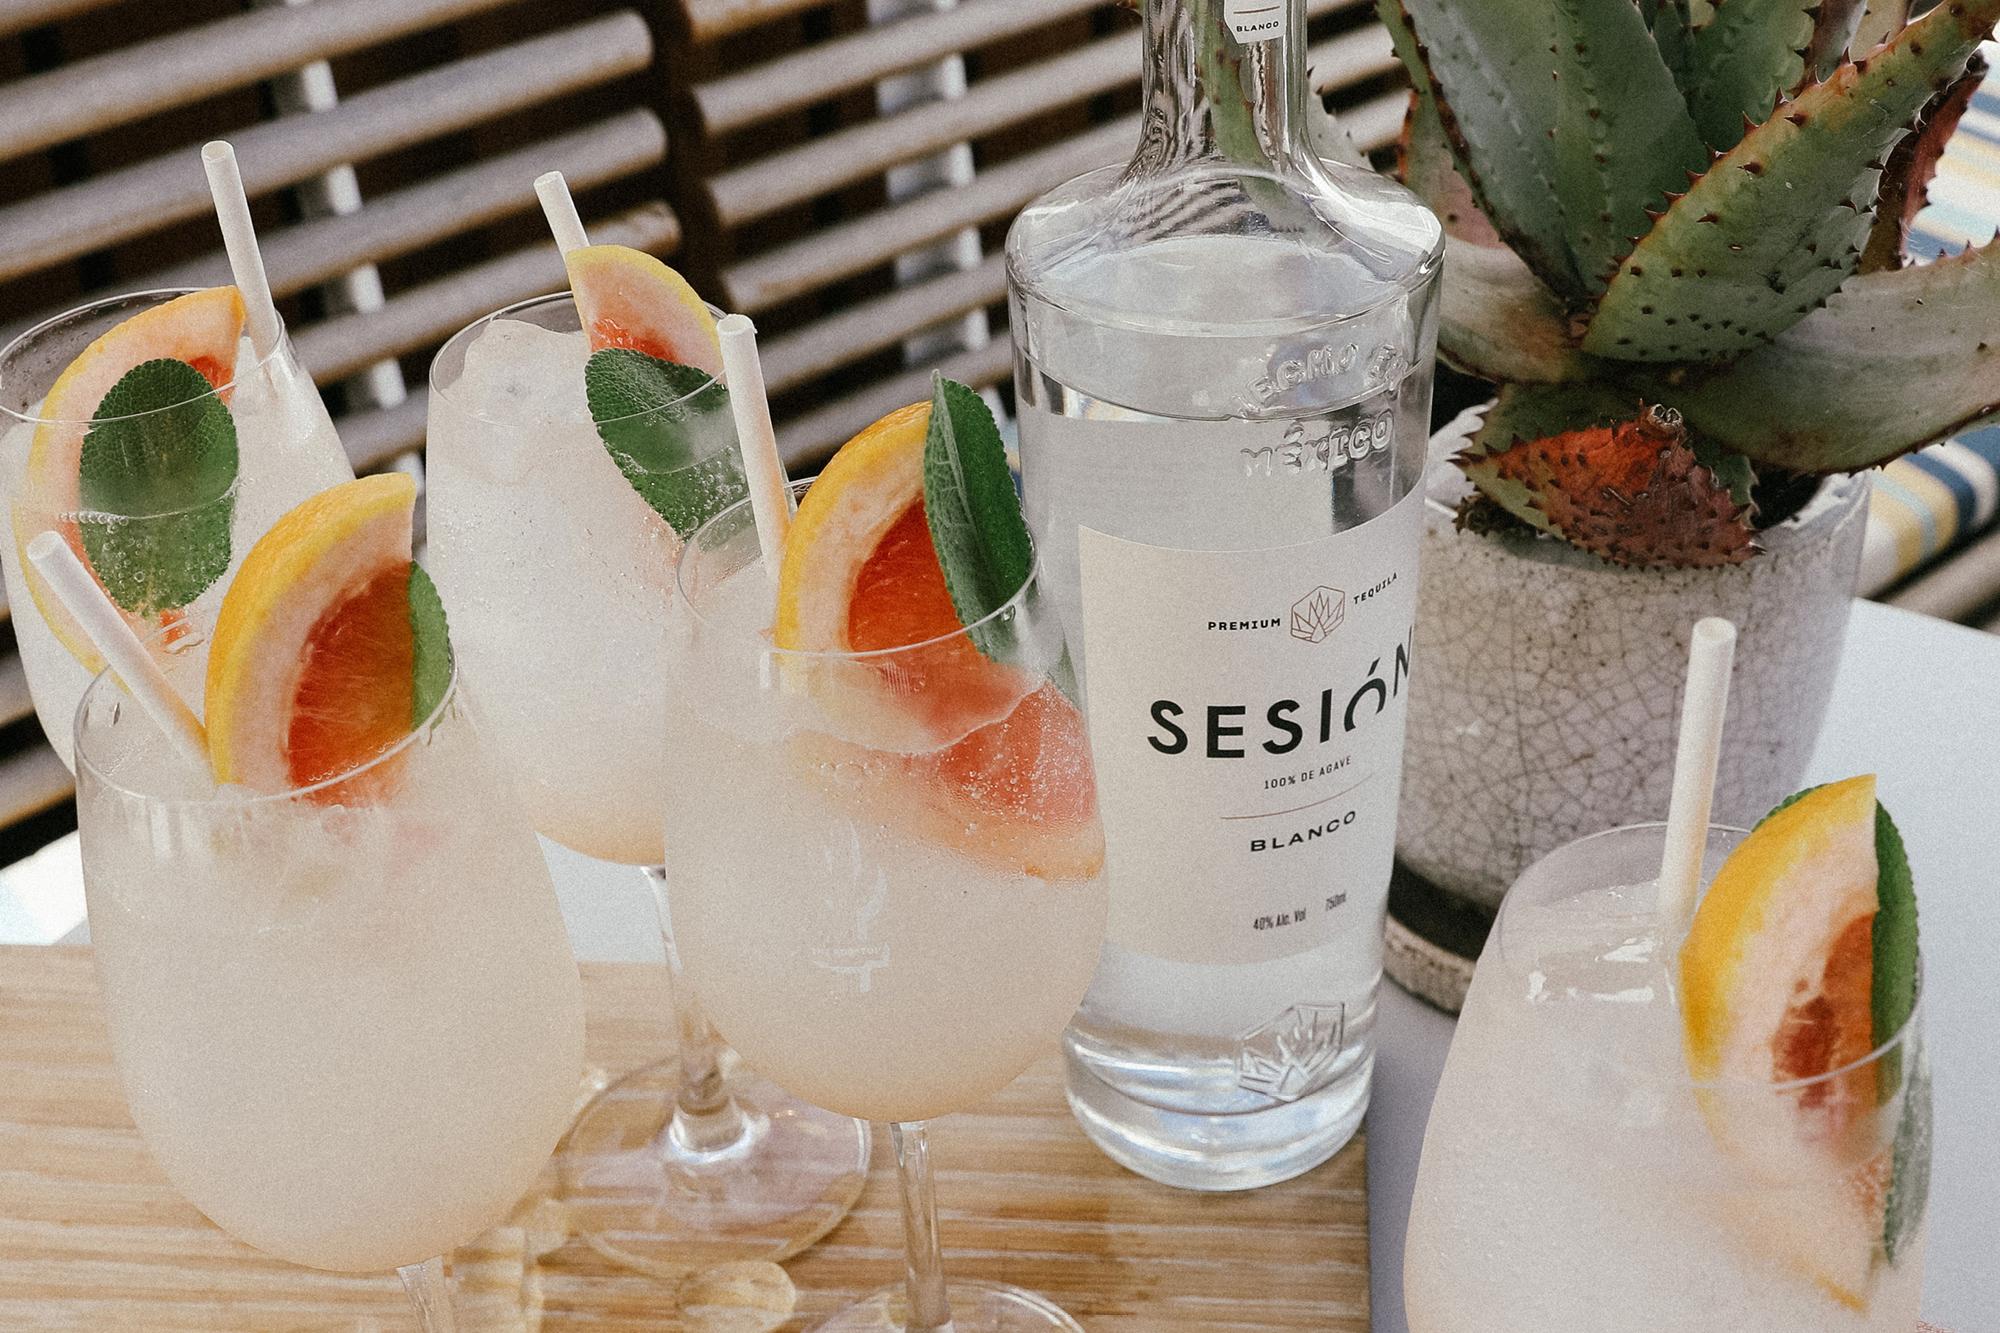 In The Press: Sesión Blanco Named Top Tequila